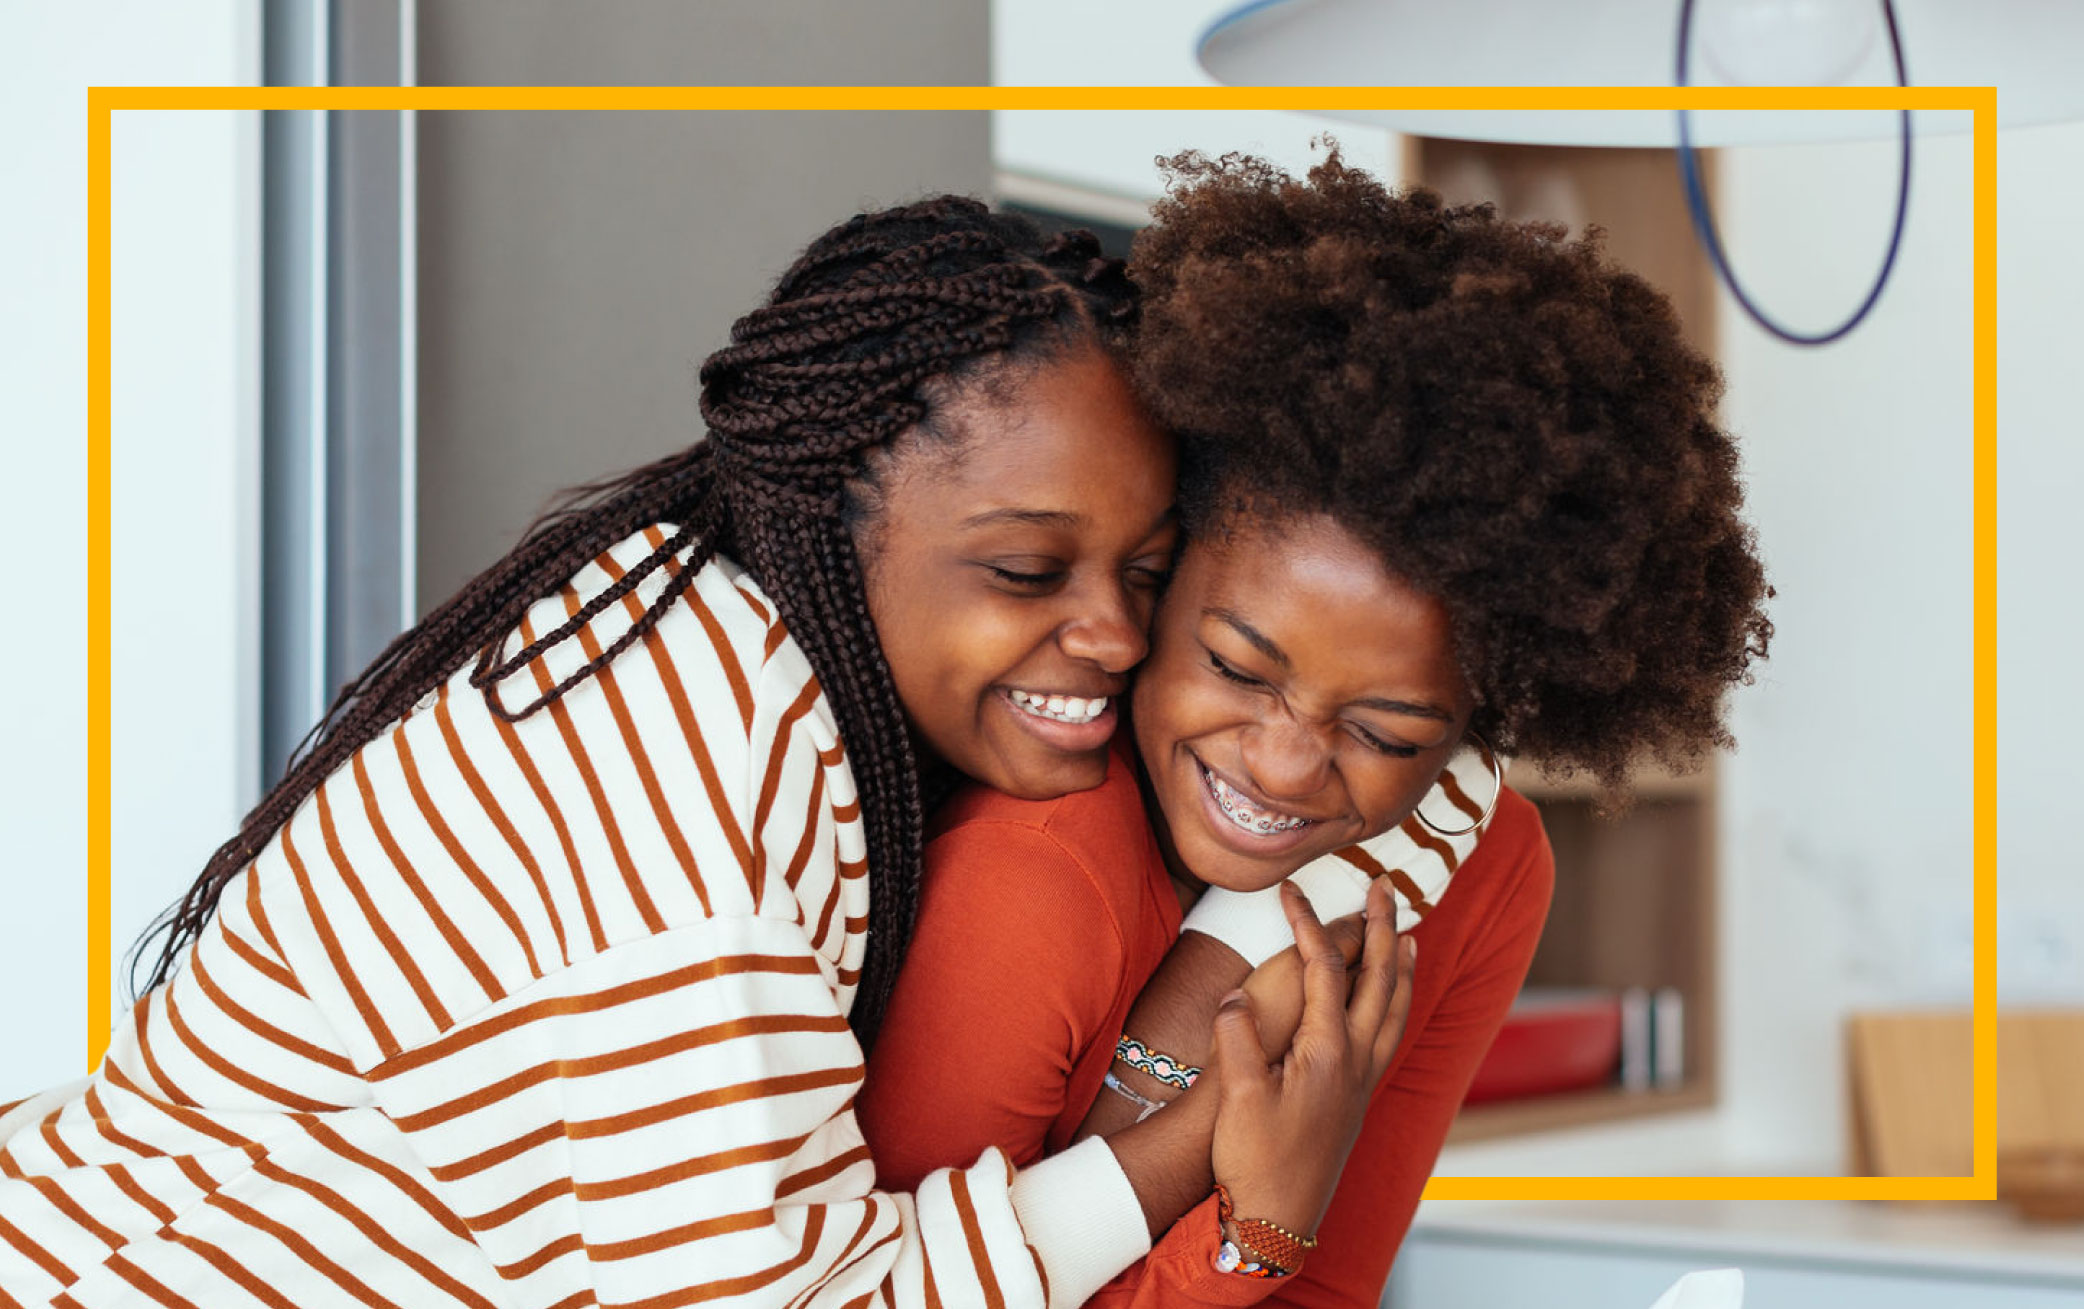 mother-daughter-hugging-smiling